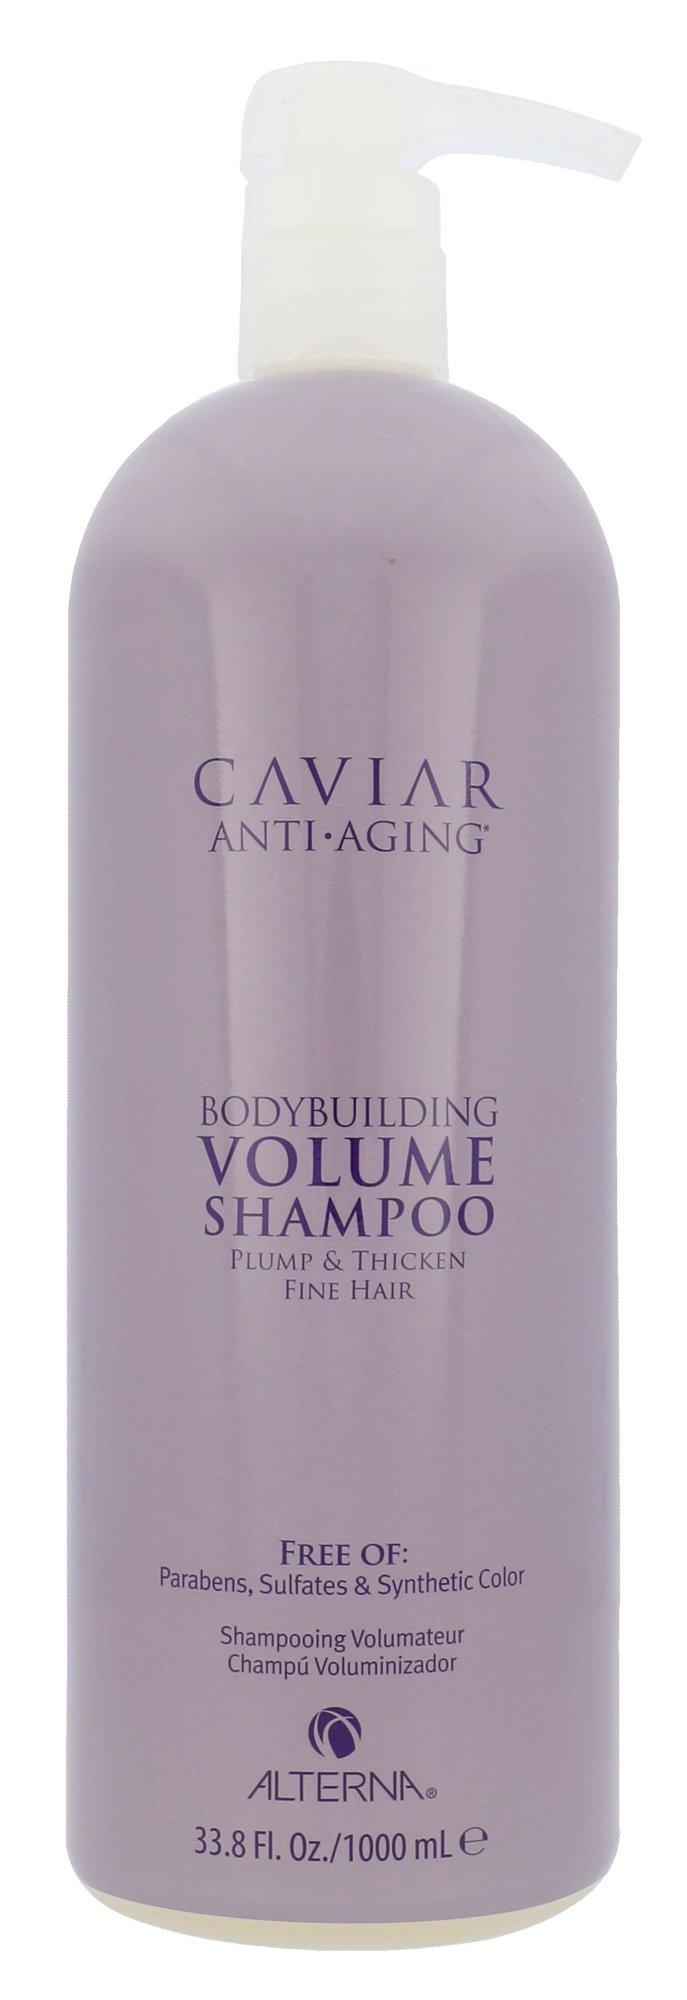 Alterna Caviar Anti-Aging Cosmetic 1000ml